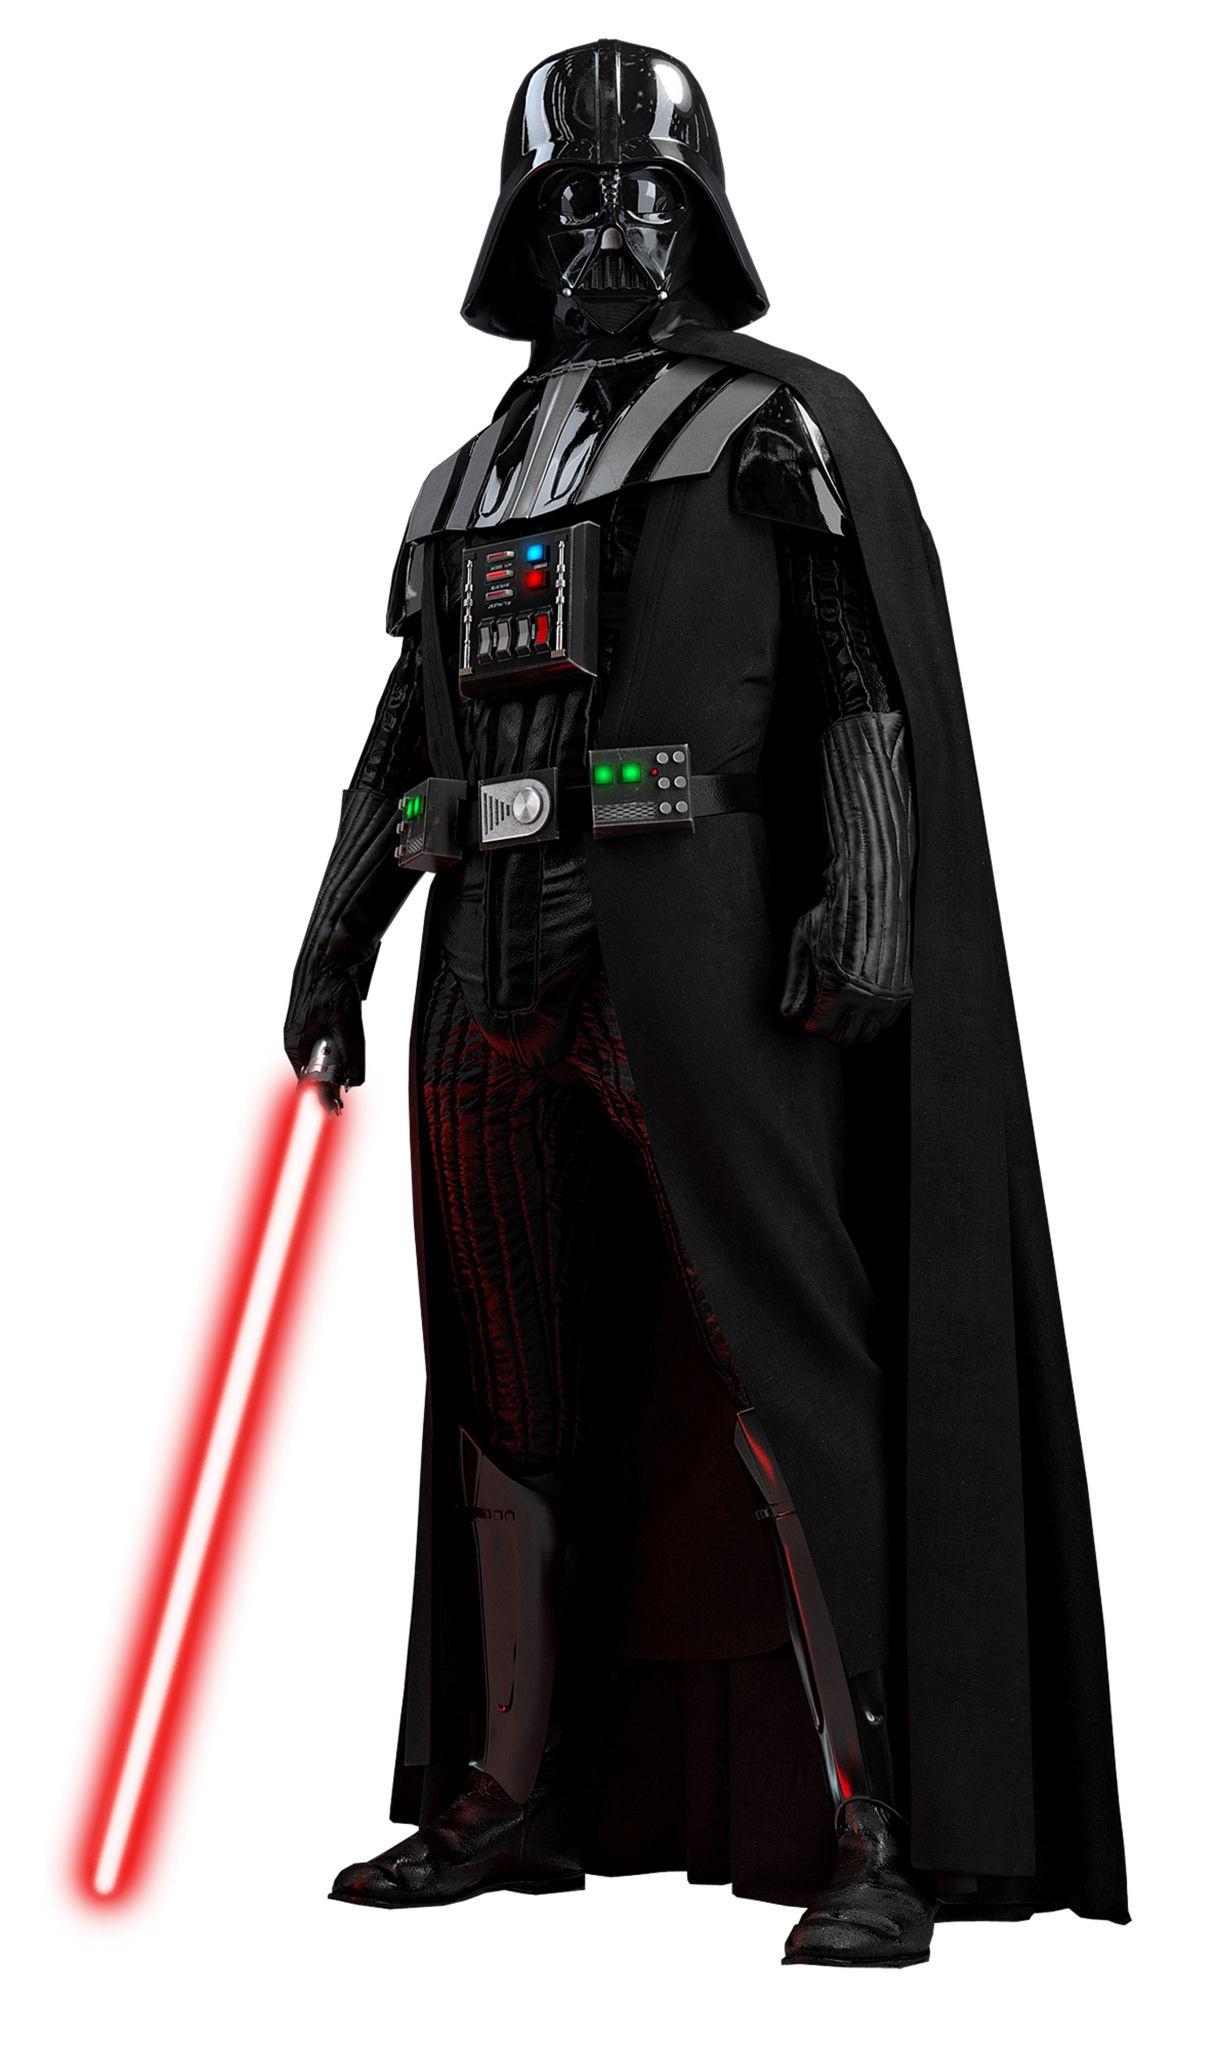 Star Wars The Black Series Darth Vader Premium Electronic Helmet Star Wars Black Series Darth Vader Helmet Star Wars Darth